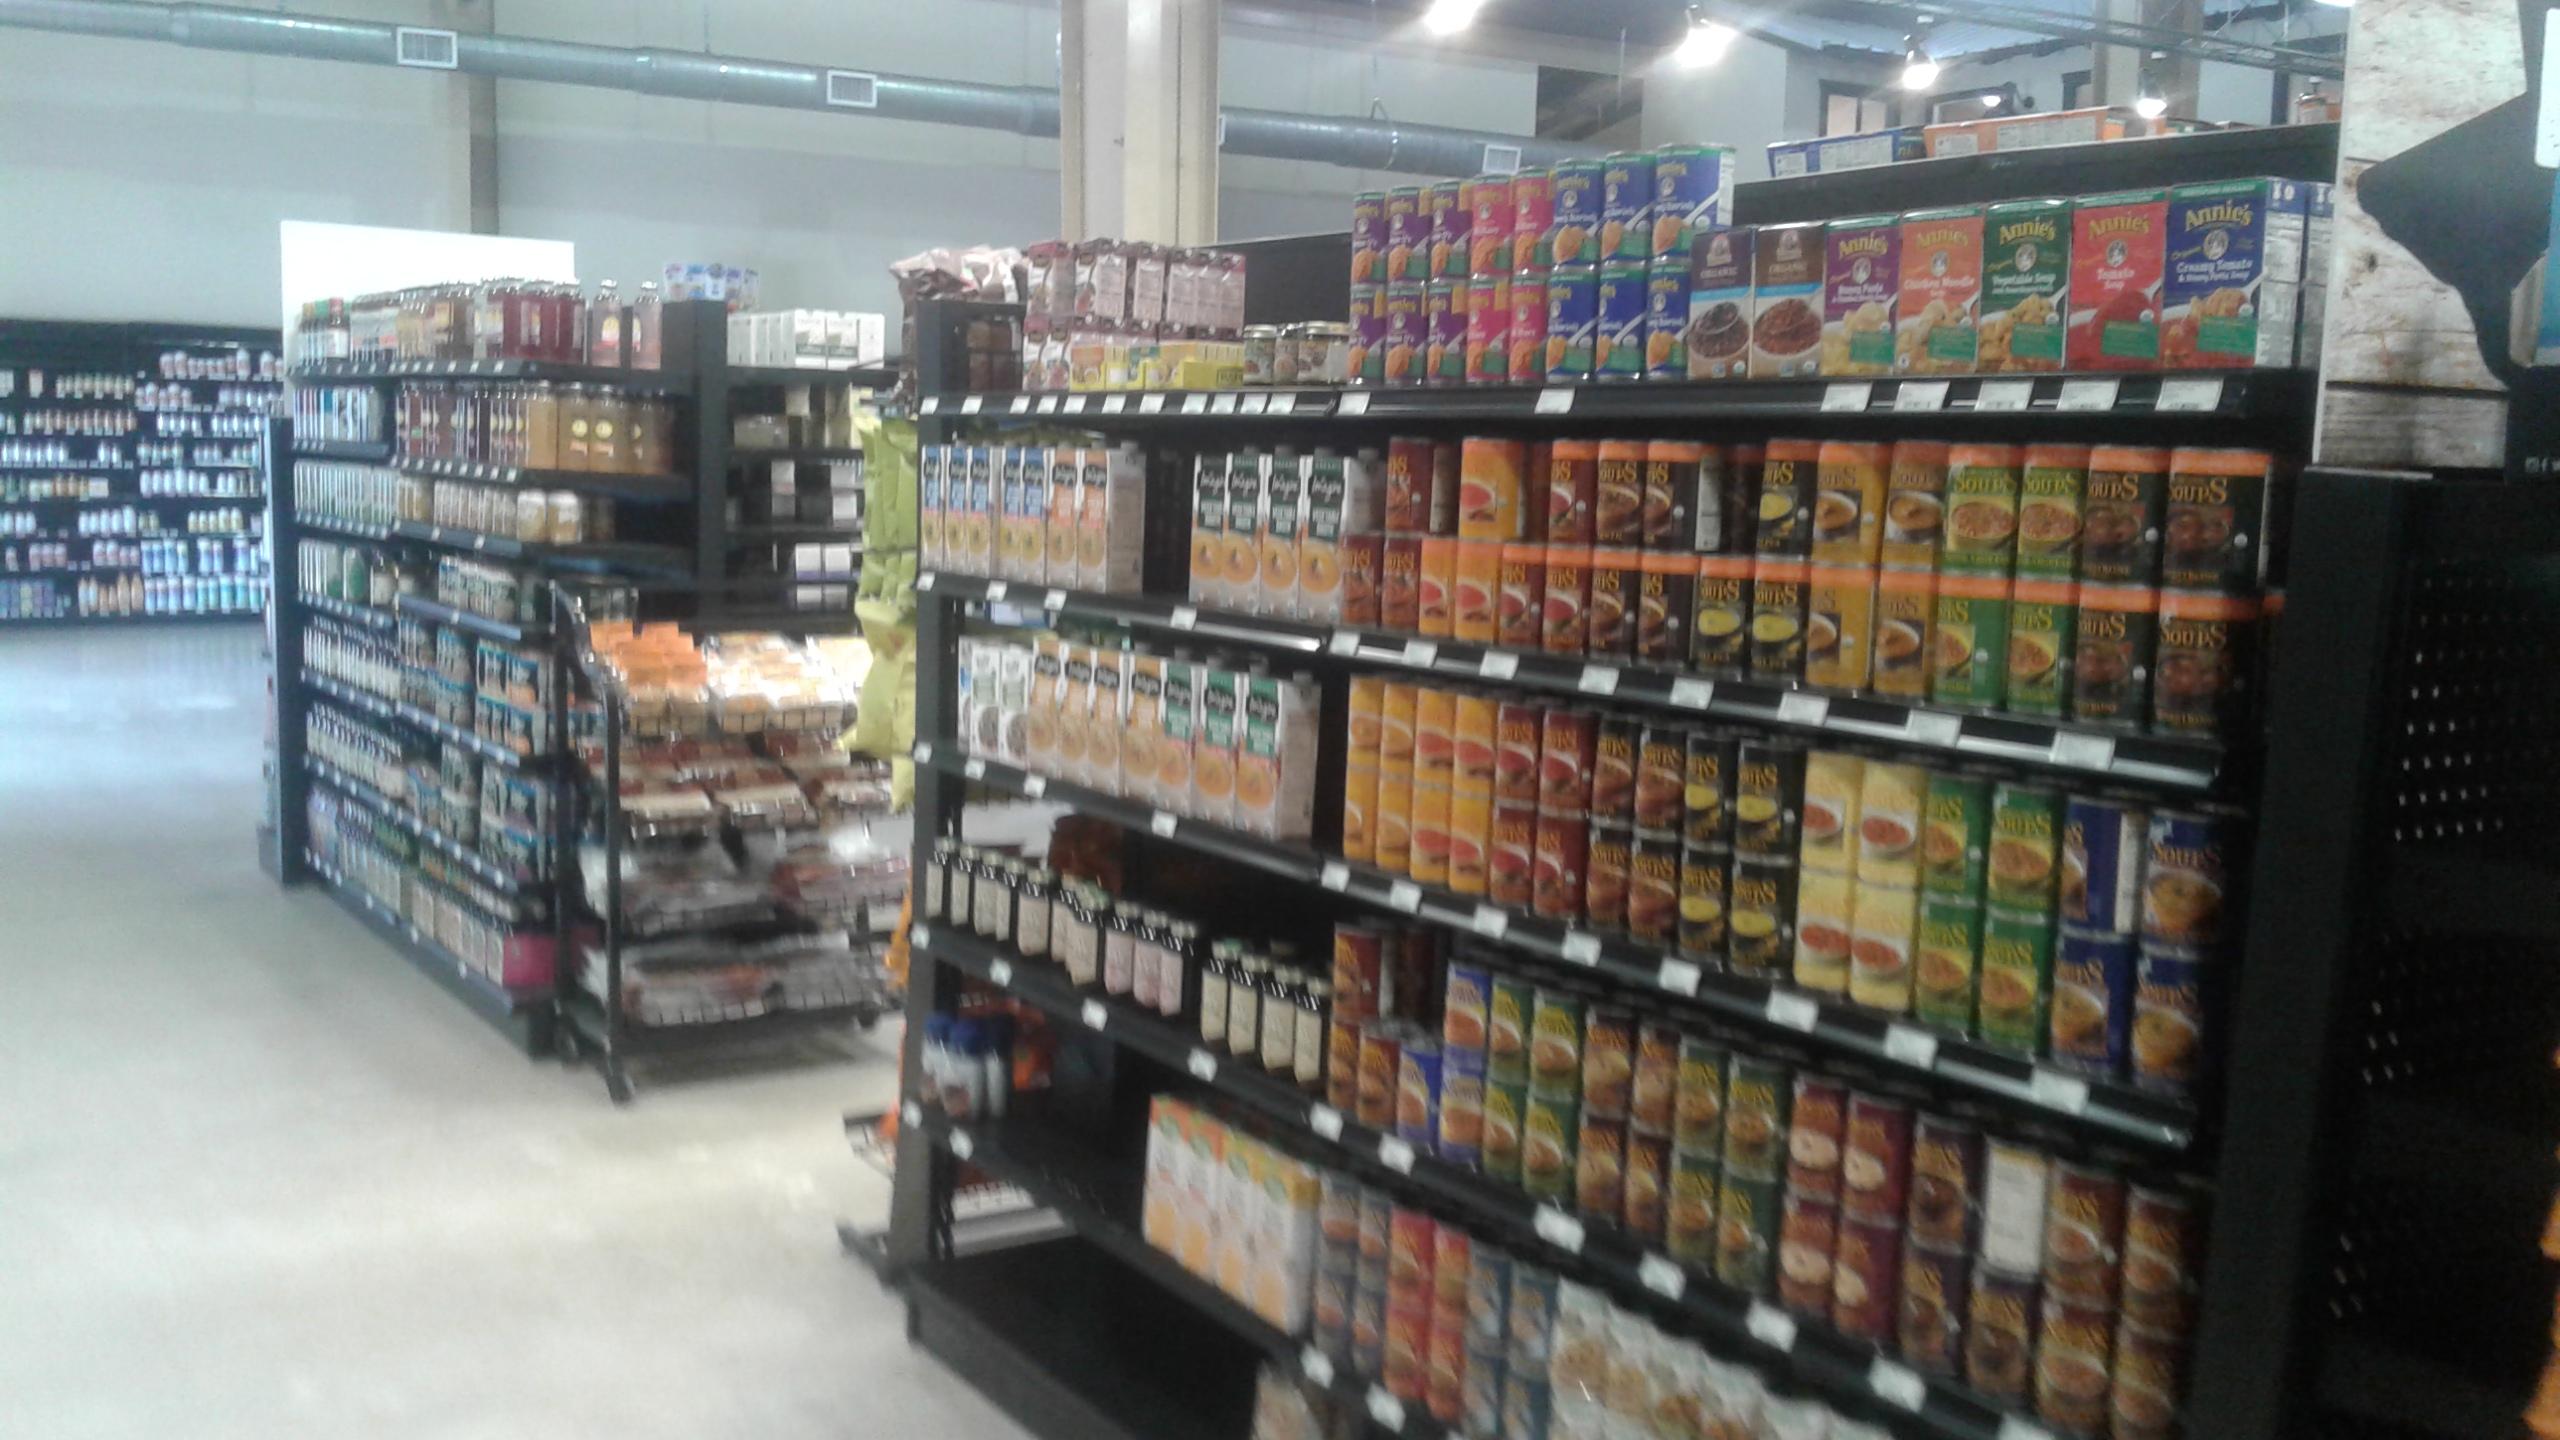 Ann S Health Food Store In Waxahachie